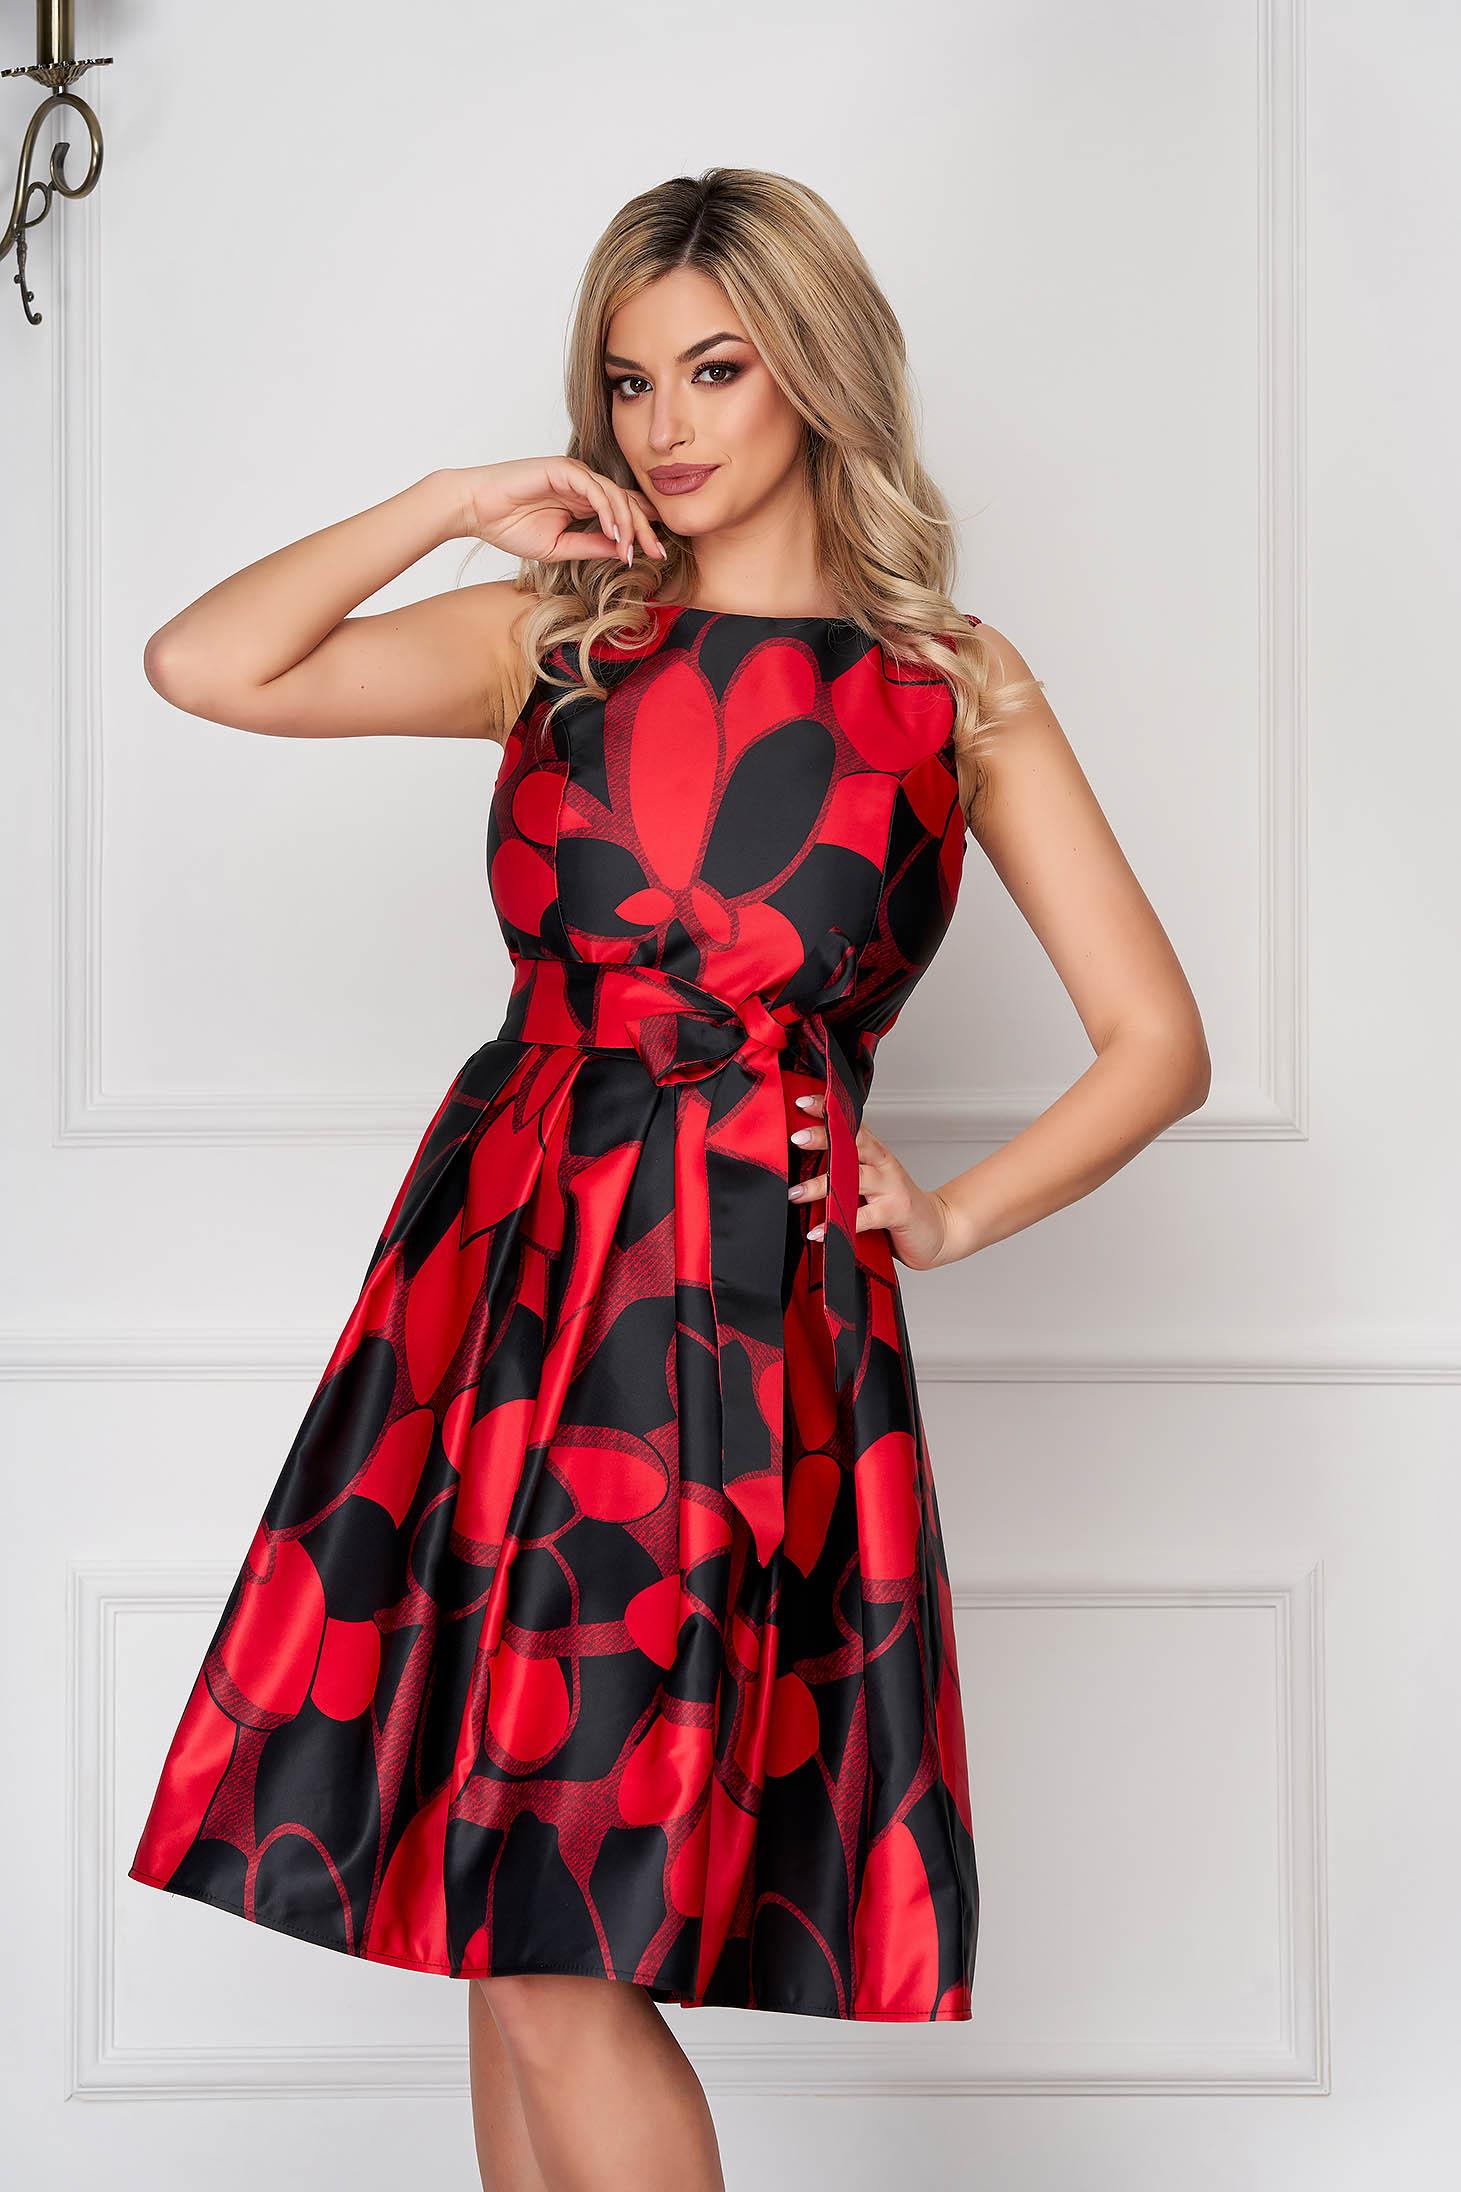 Rochie Artista rosie midi de ocazie din satin fara maneci cu imprimeu floral